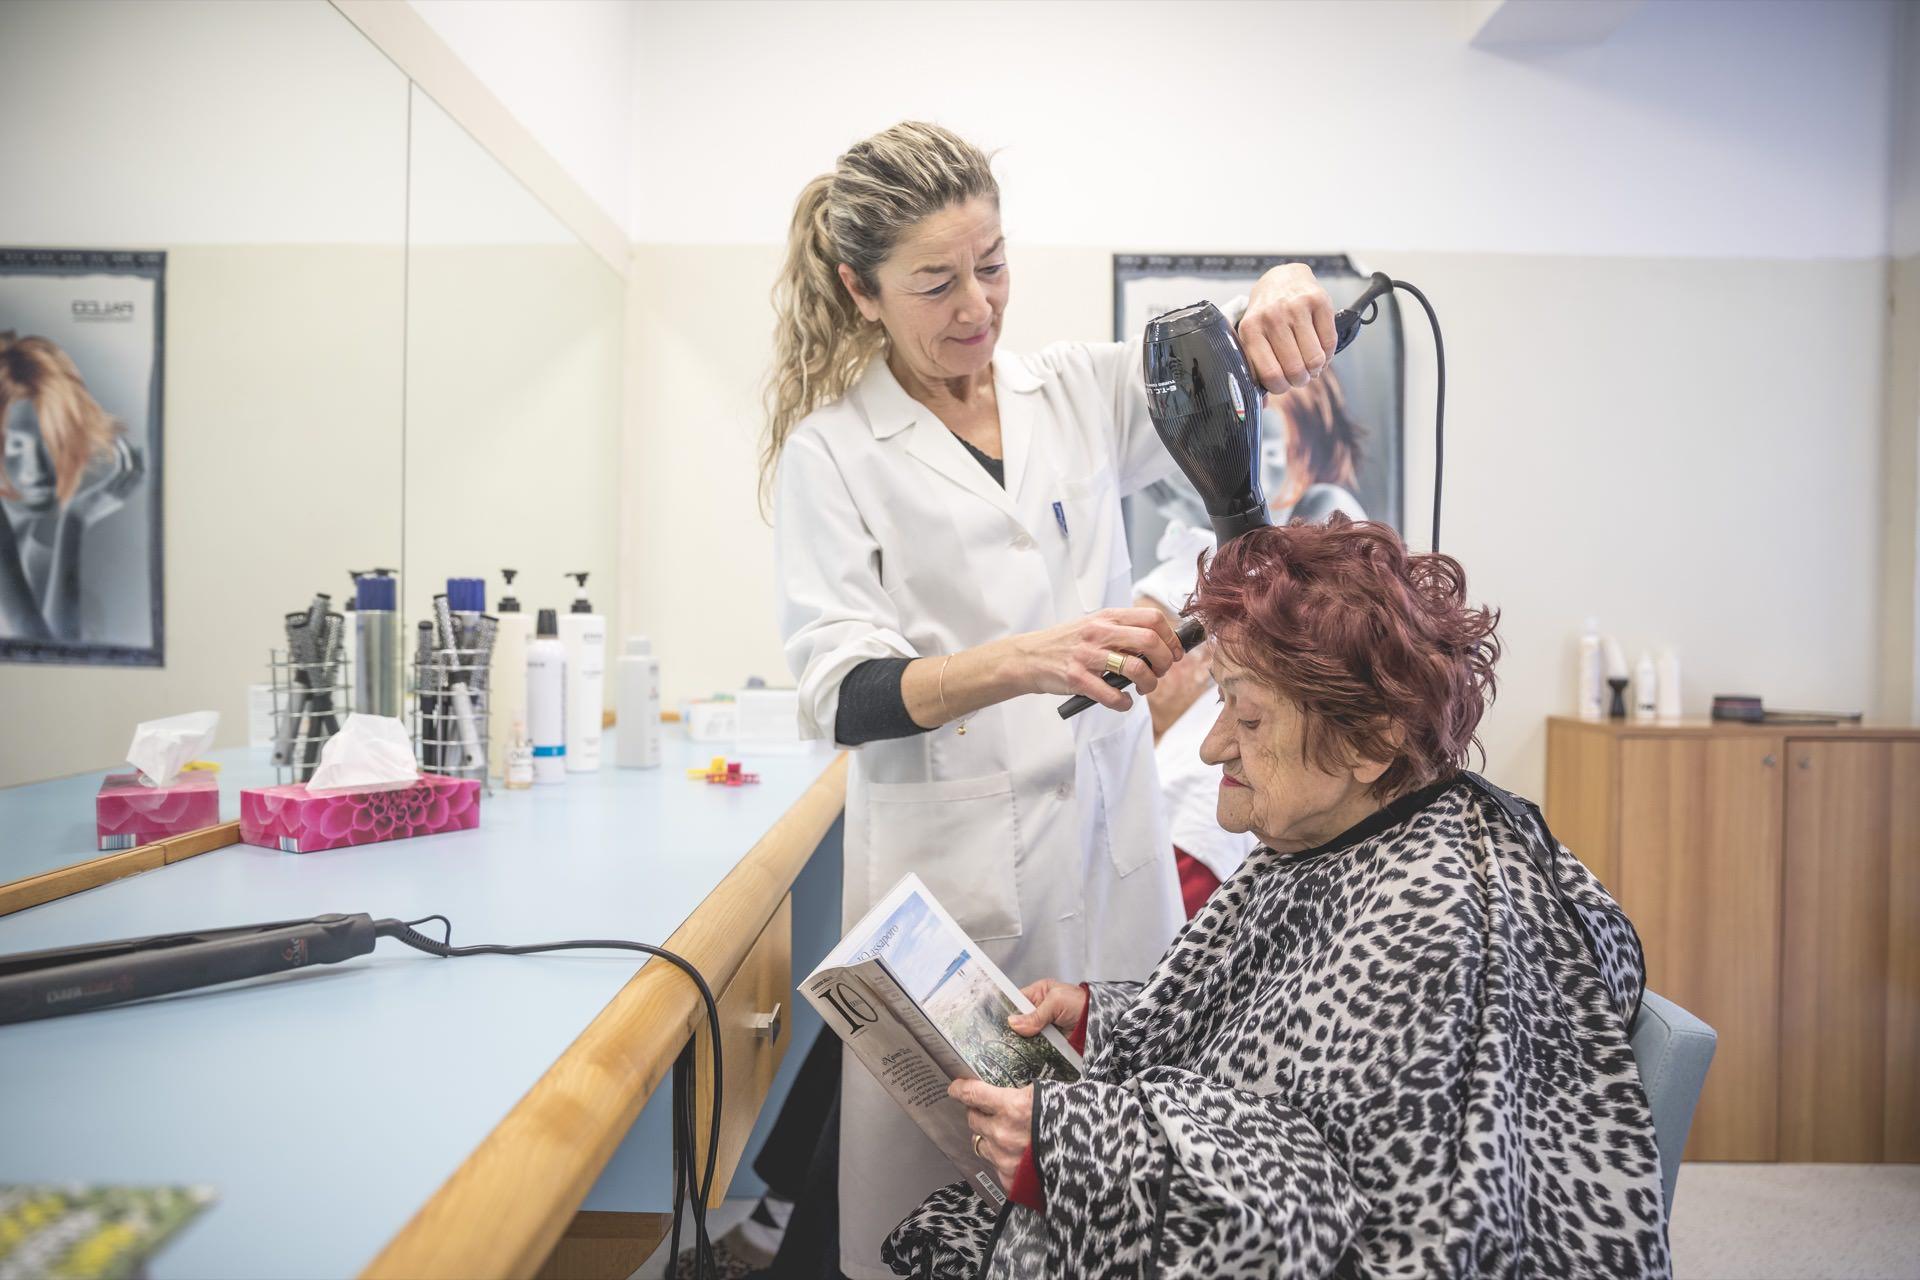 Casa di Riposo Orsi Mangelli Forlì parrucchiere